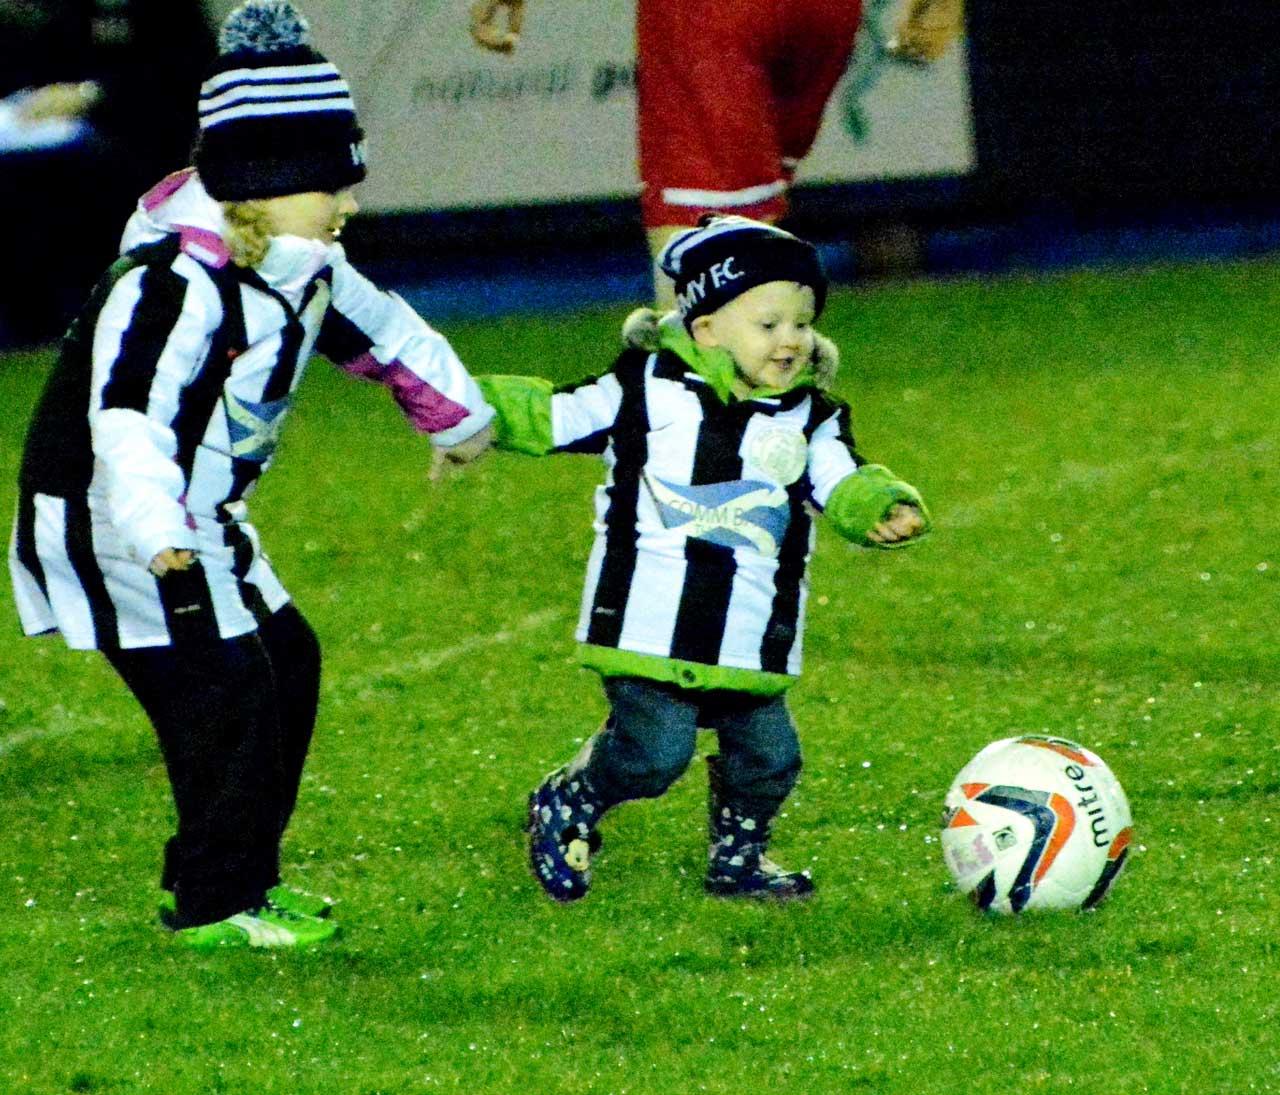 Photo: Junior wows 'em at derby clash